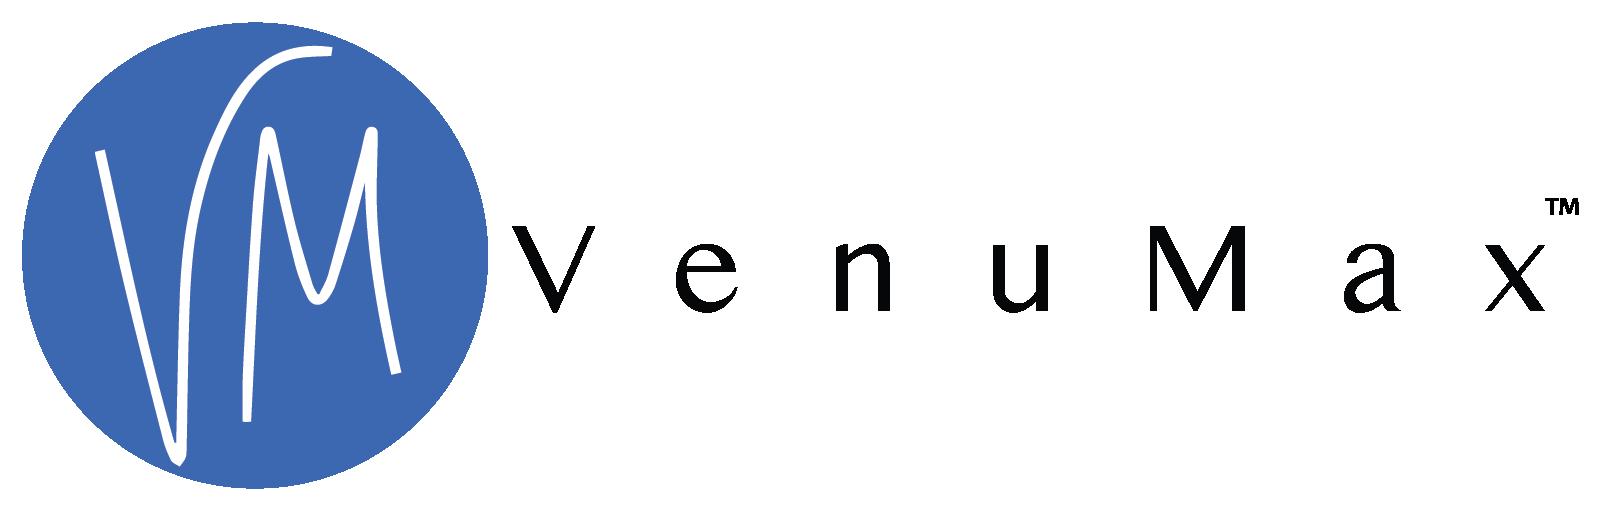 VenuMax - Venue Management Solution - mbsPartners